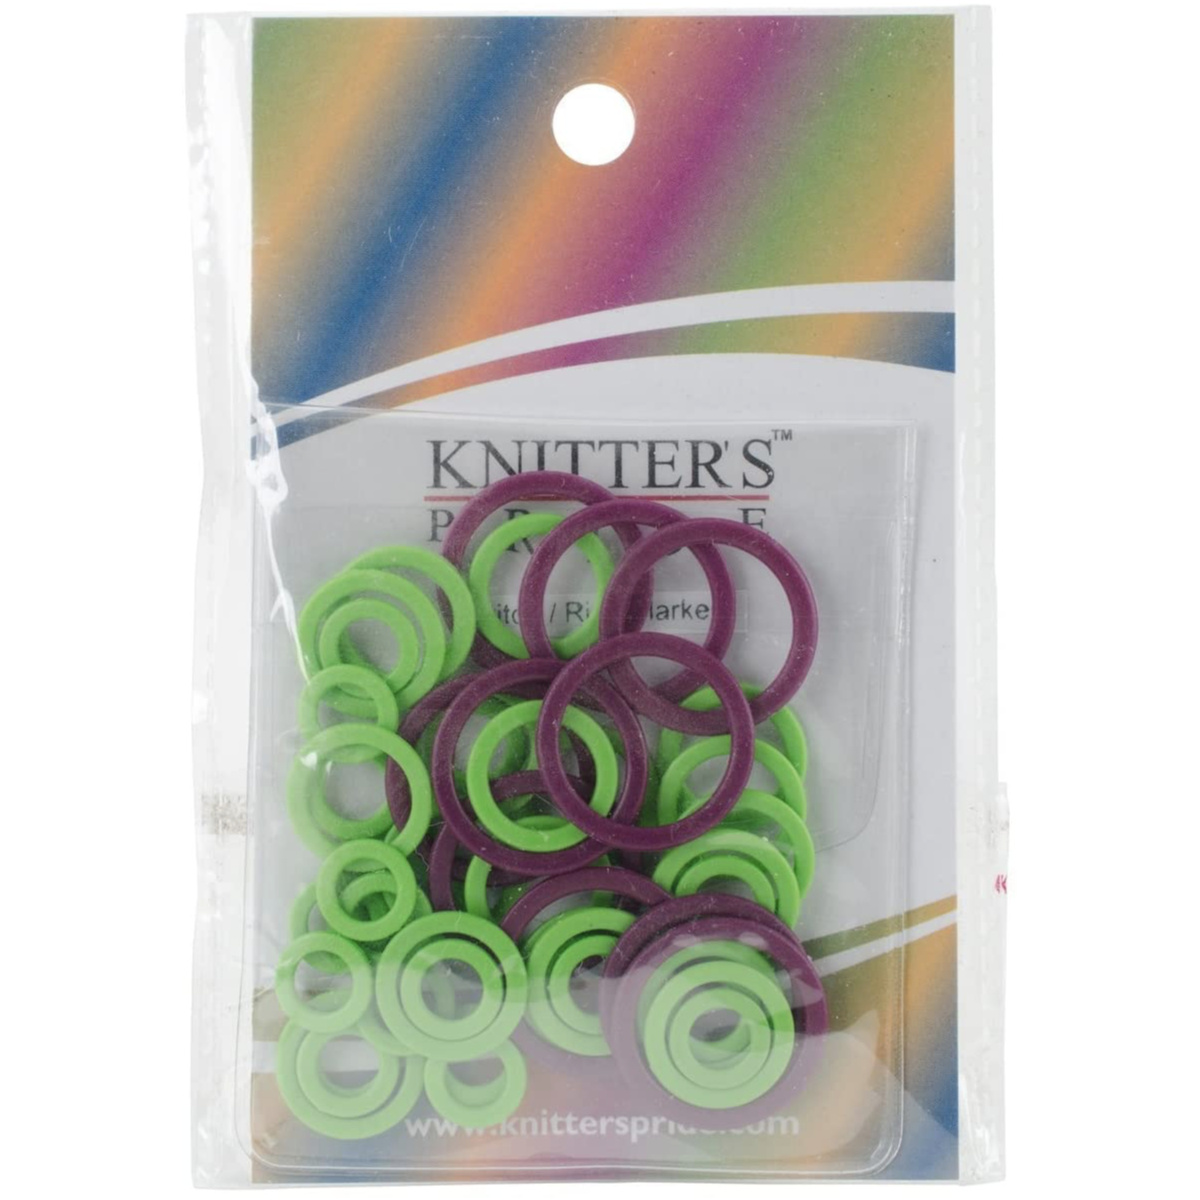 Knitter's Pride Knitter's Pride Stitch Ring Marker